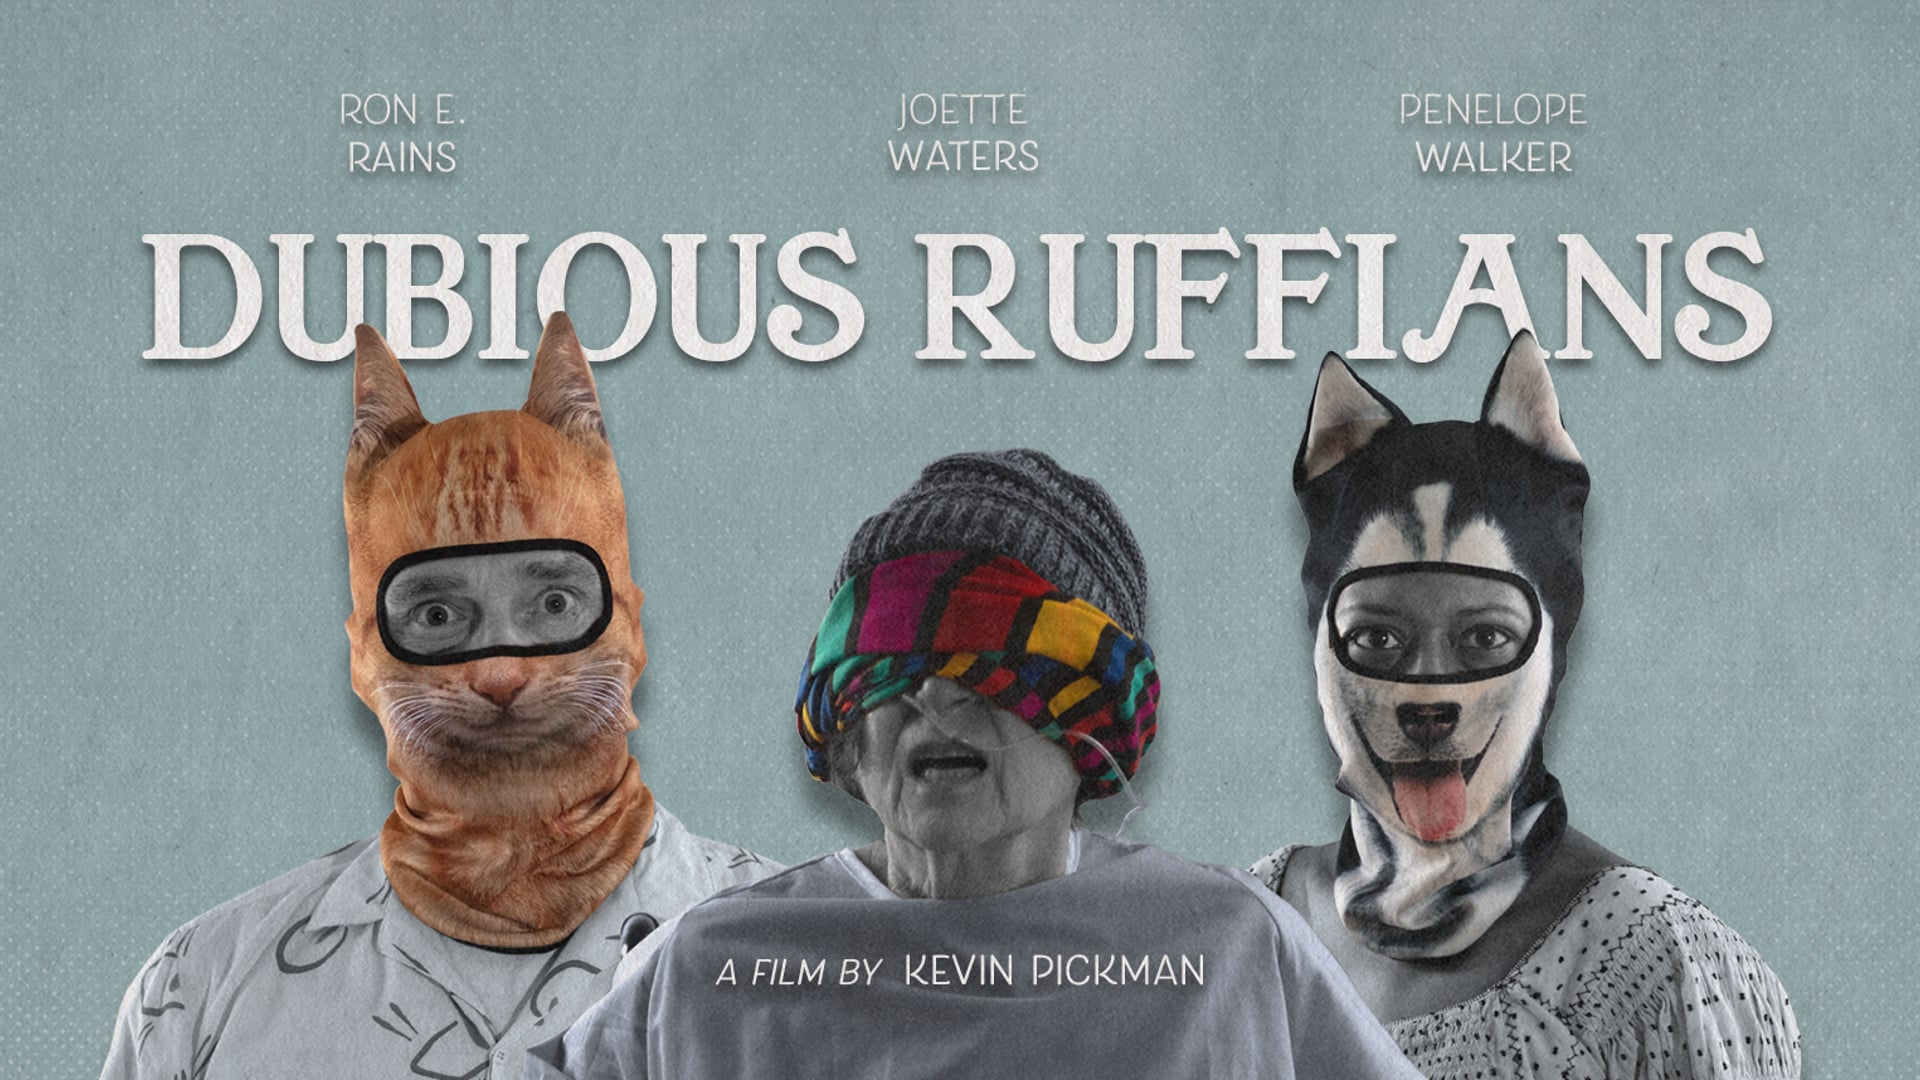 Dubious Ruffians